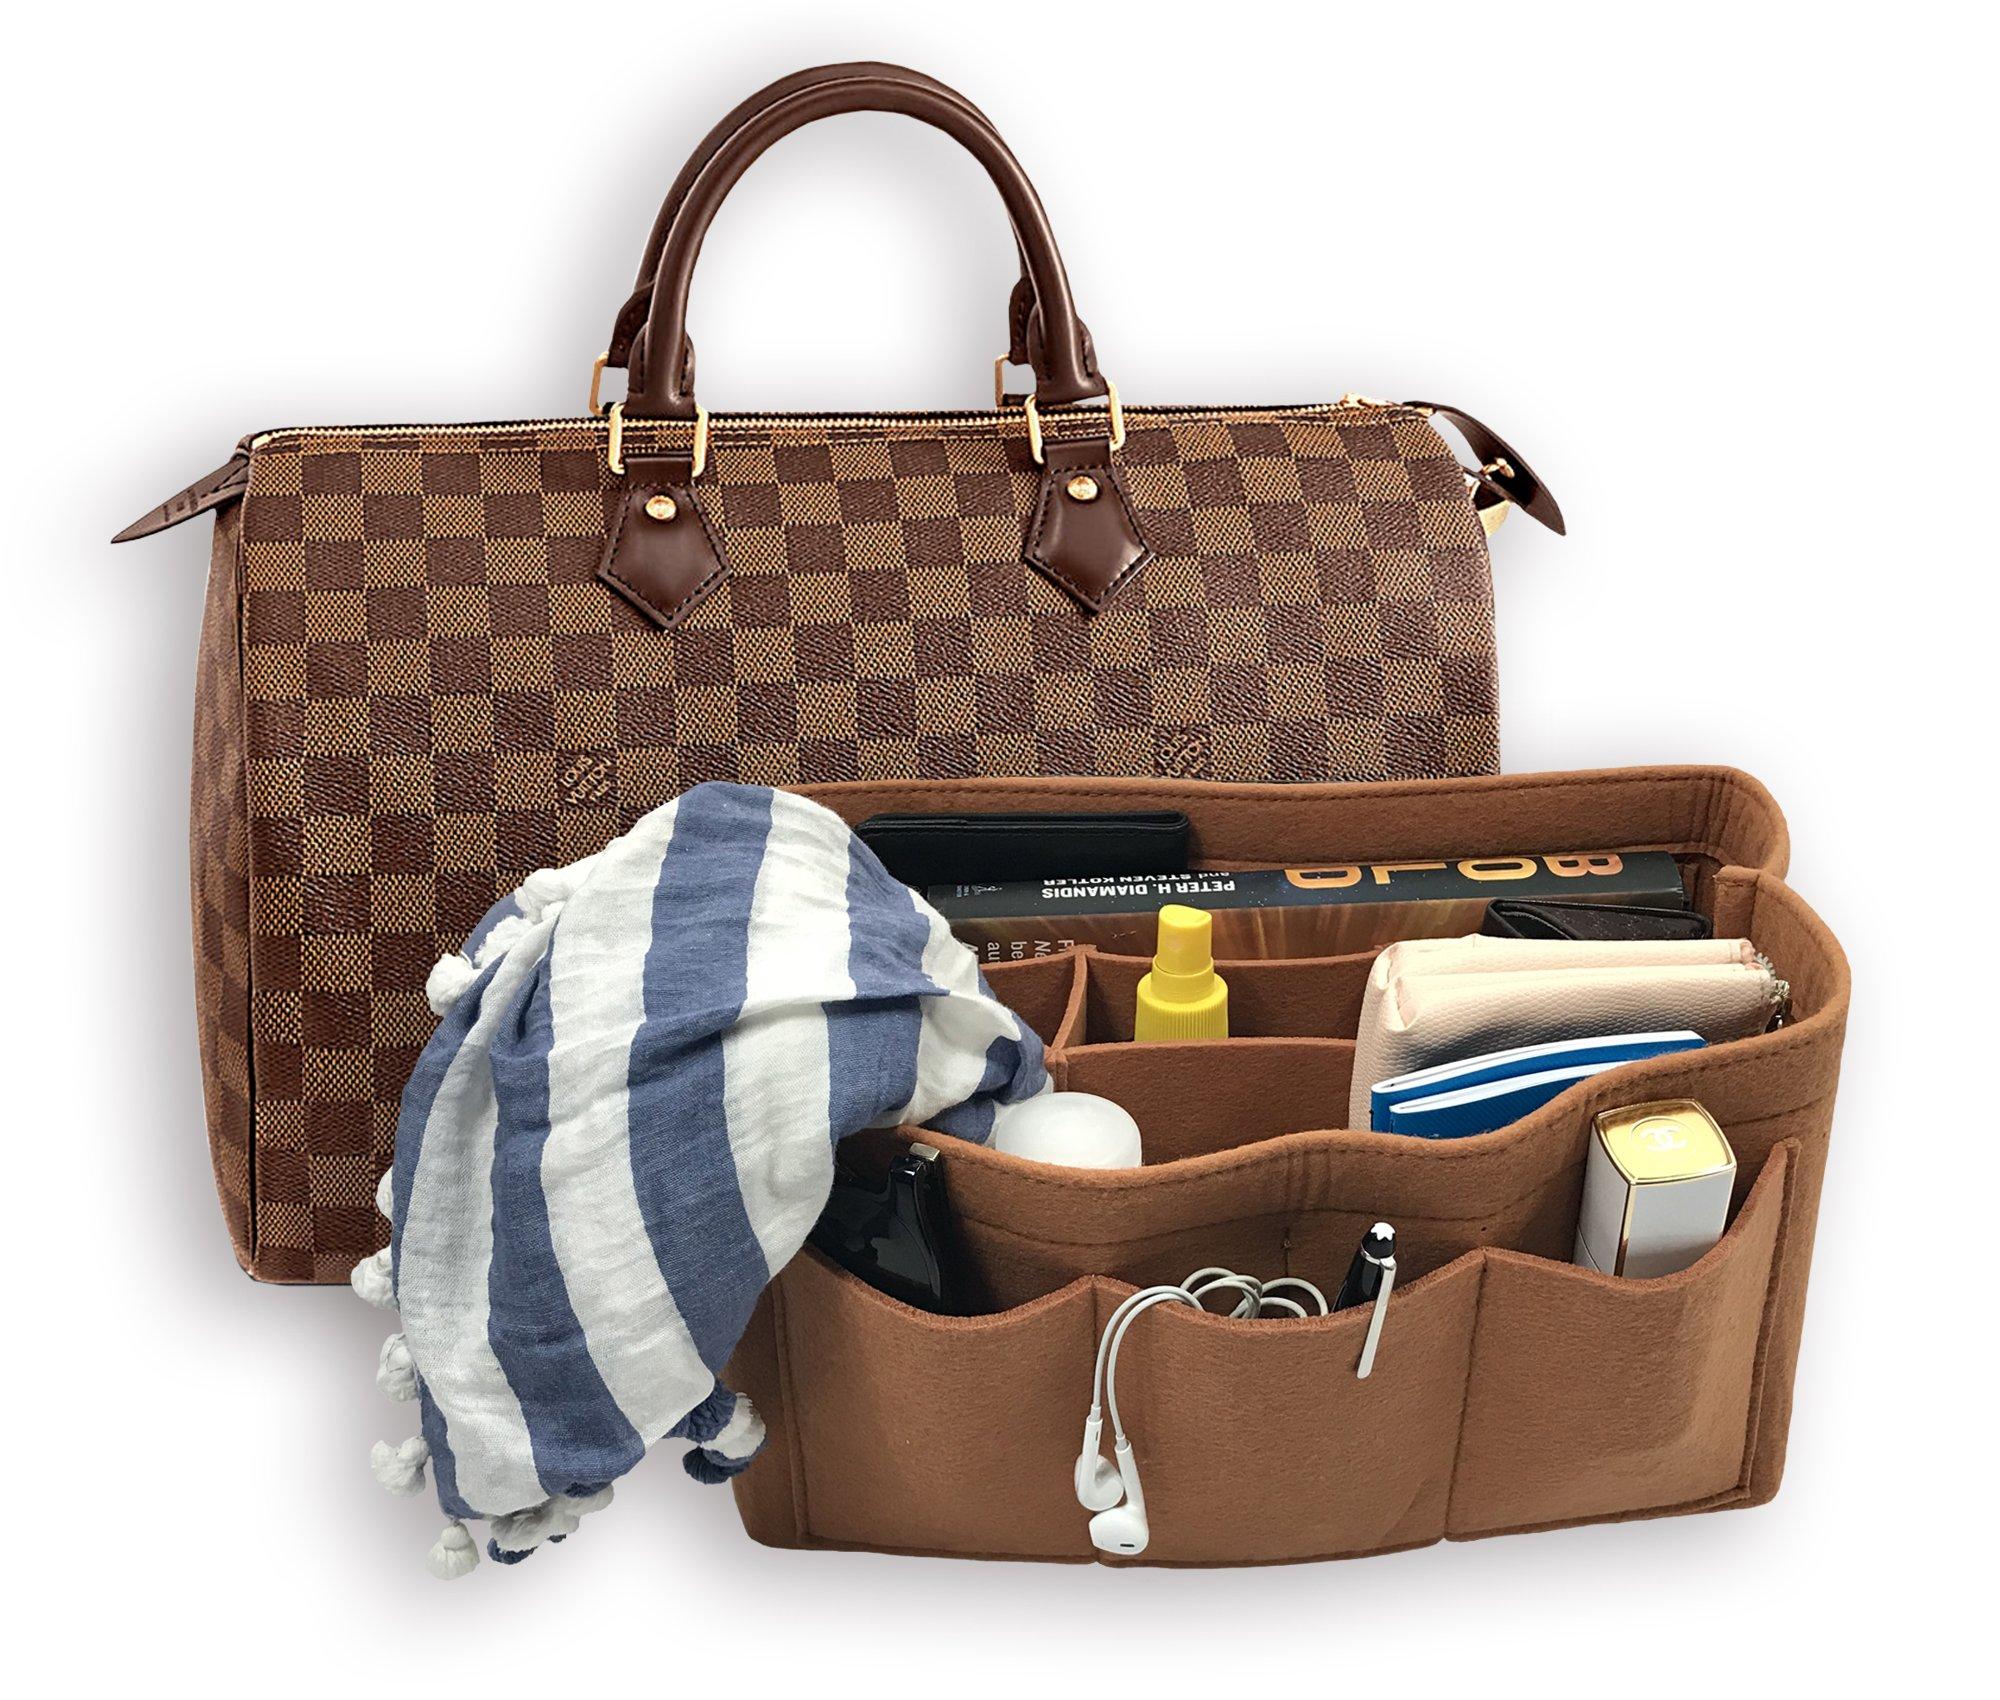 Felt Purse Handbag Organizer Bag In Bag. MultiPocket Handbag Purse Organizer. Two colors black and brown.